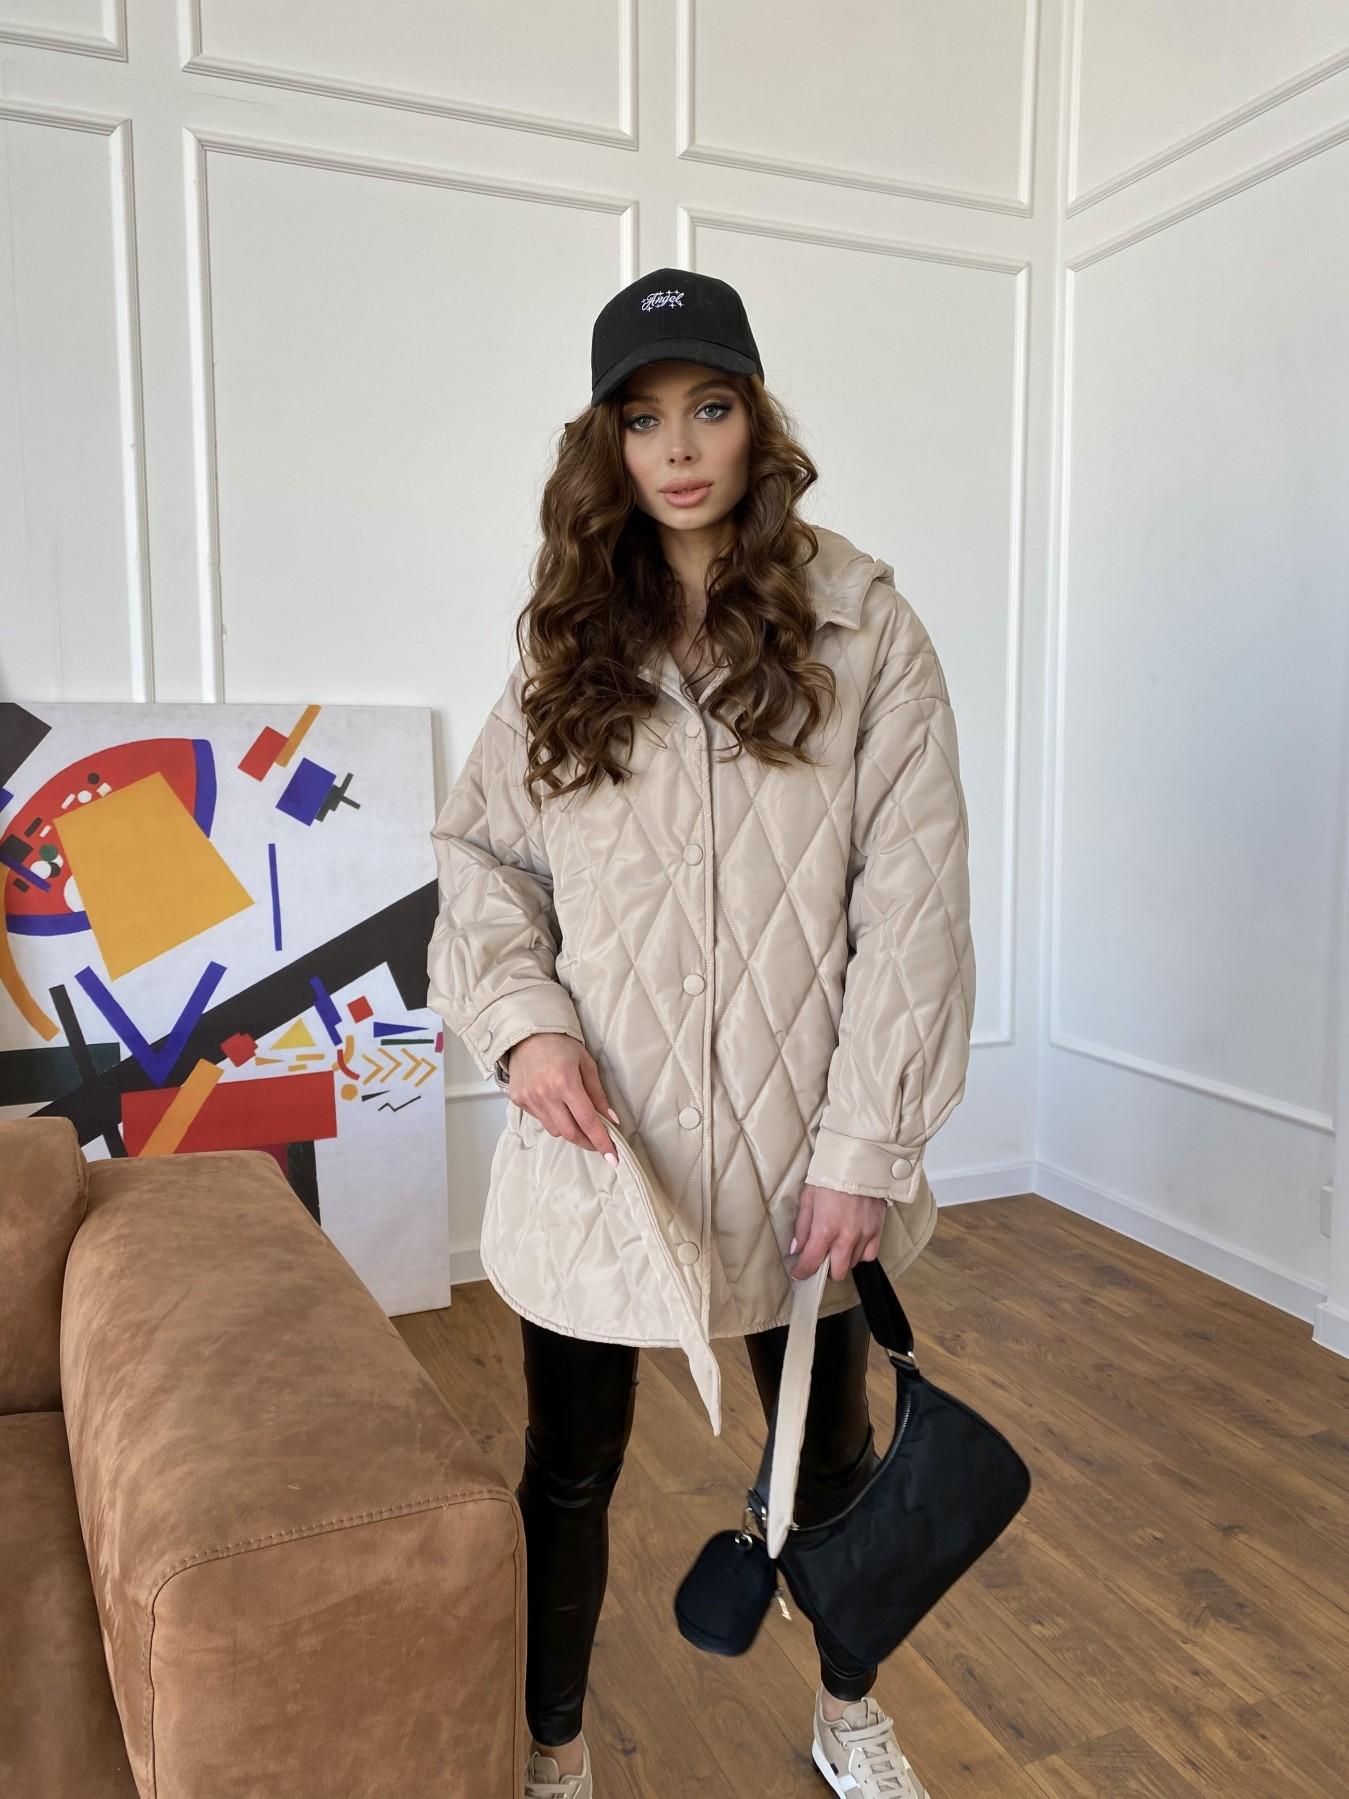 Пазл стеганая куртка из плащевки 10890 АРТ. 47449 Цвет: Бежевый - фото 8, интернет магазин tm-modus.ru